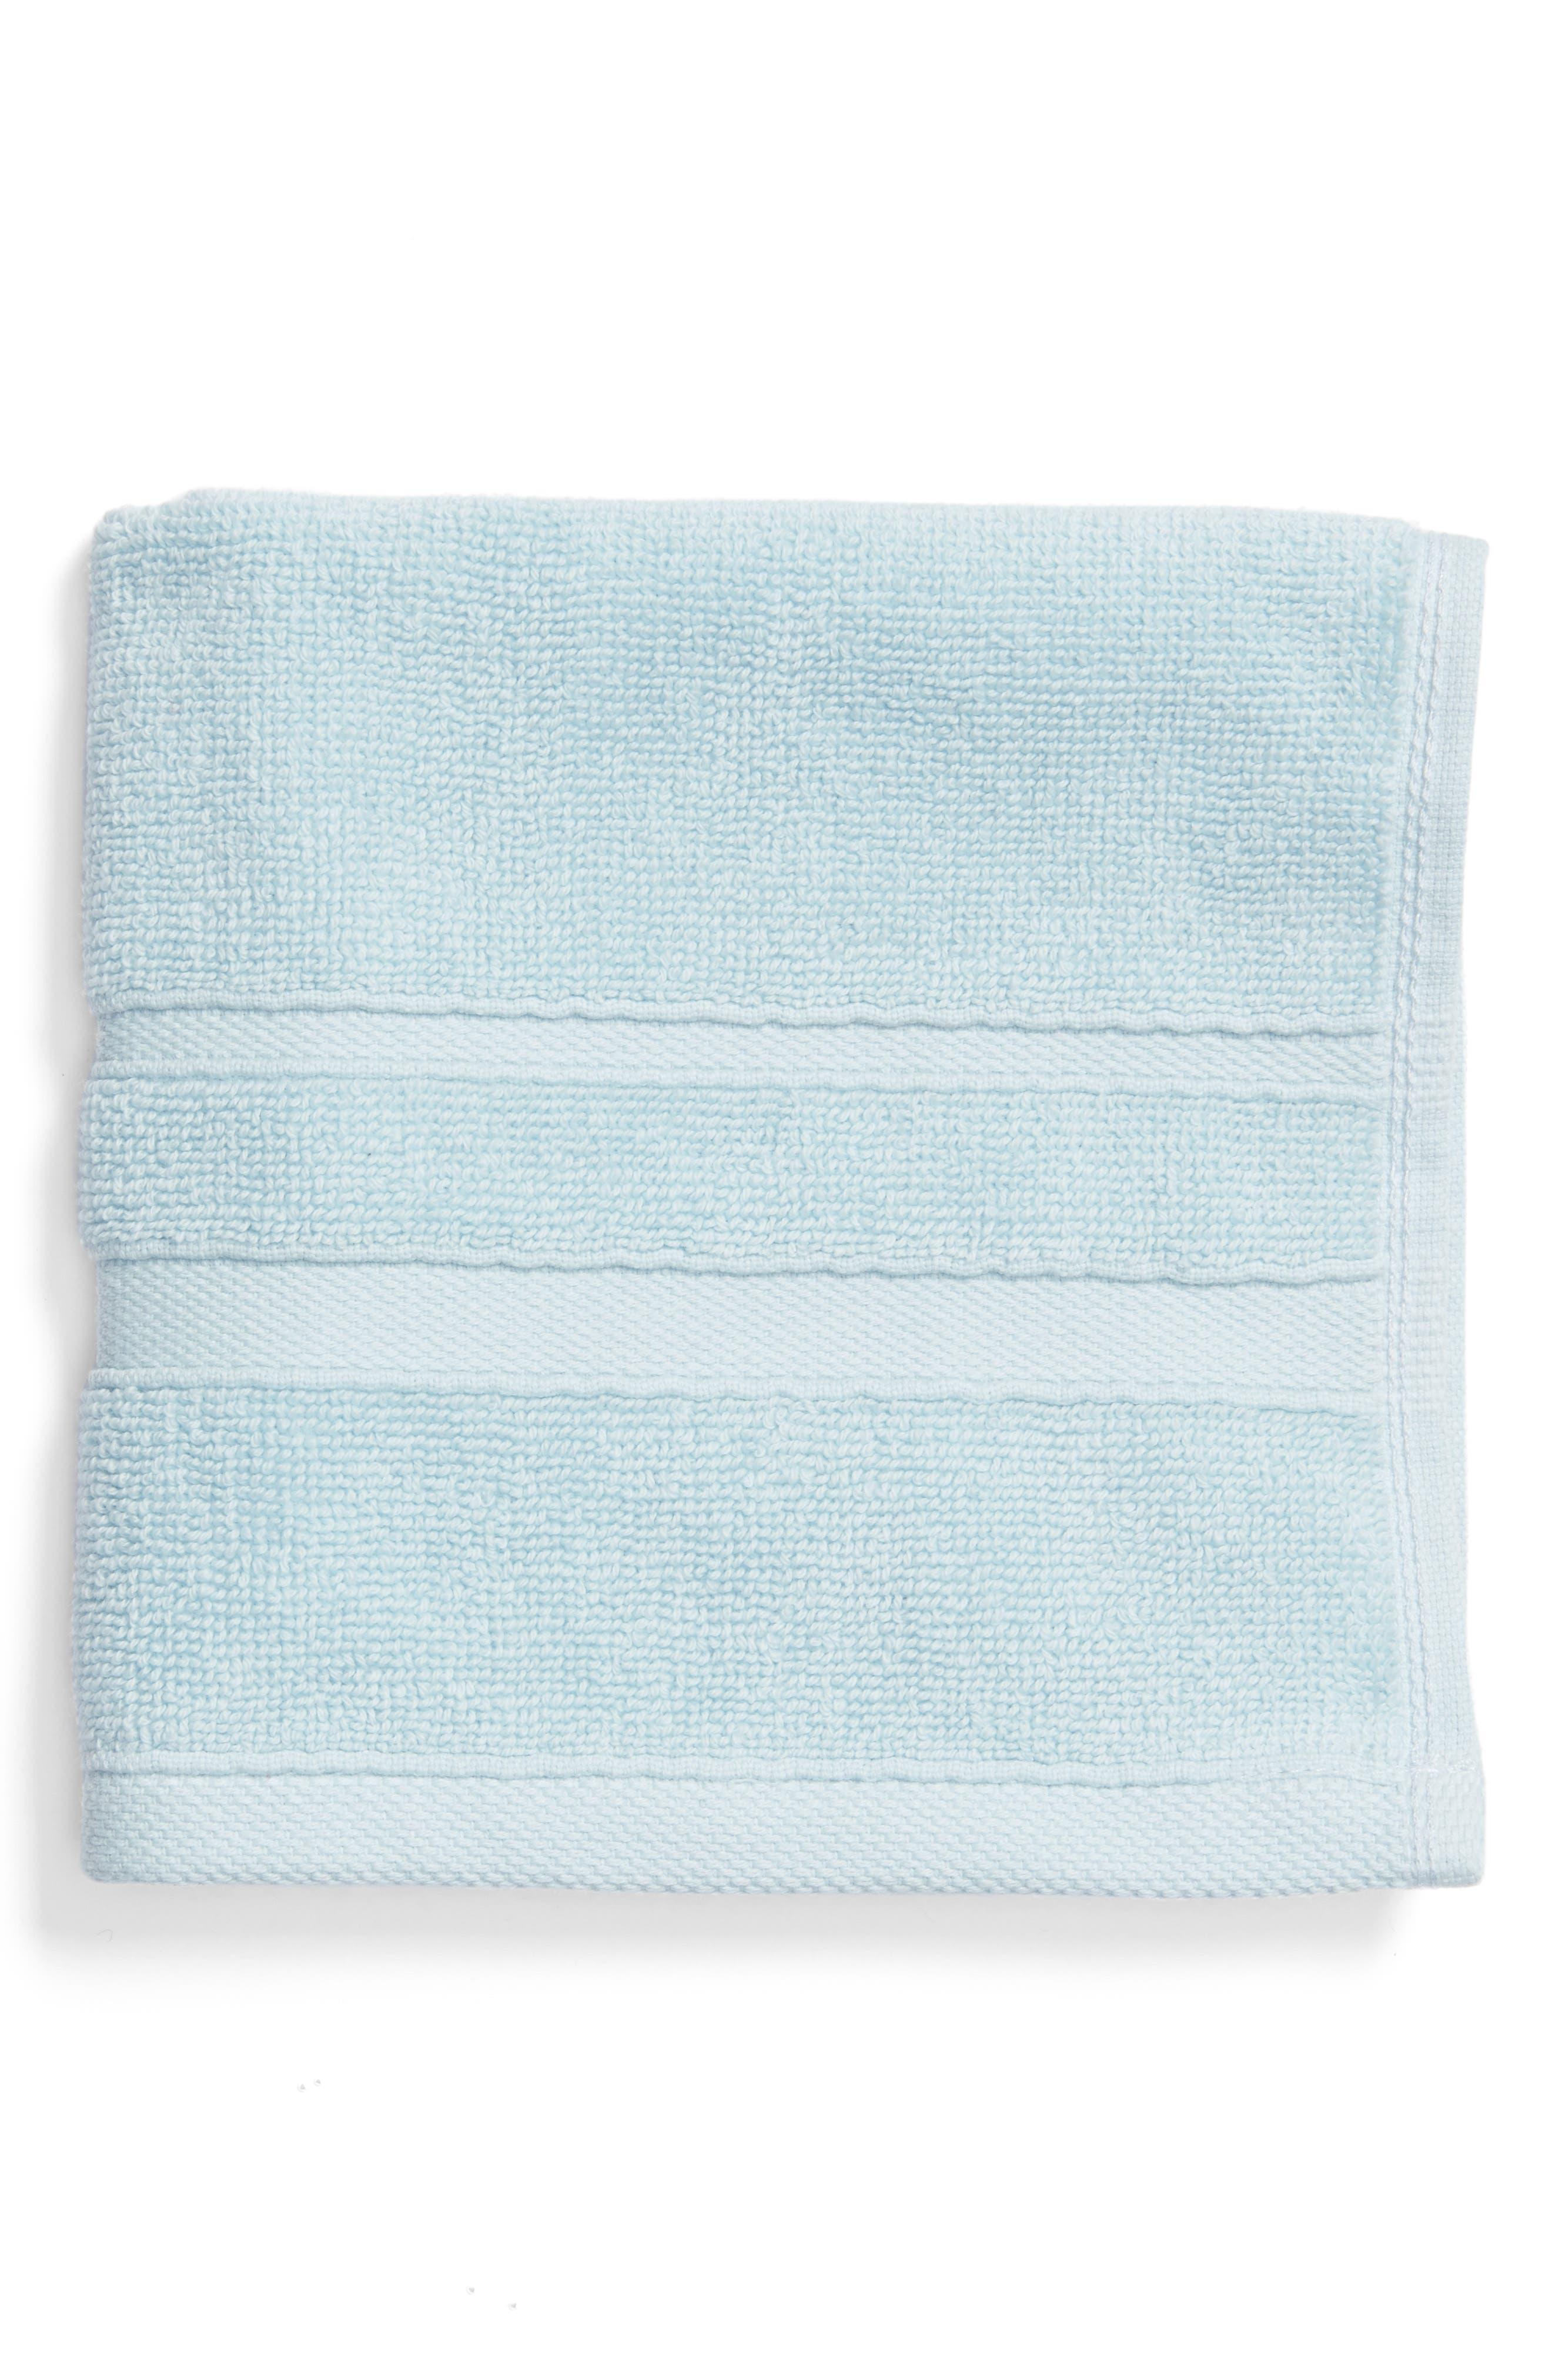 Studio 'Perennial' Combed Turkish Cotton Washcloth,                             Main thumbnail 1, color,                             Chrystal Blue